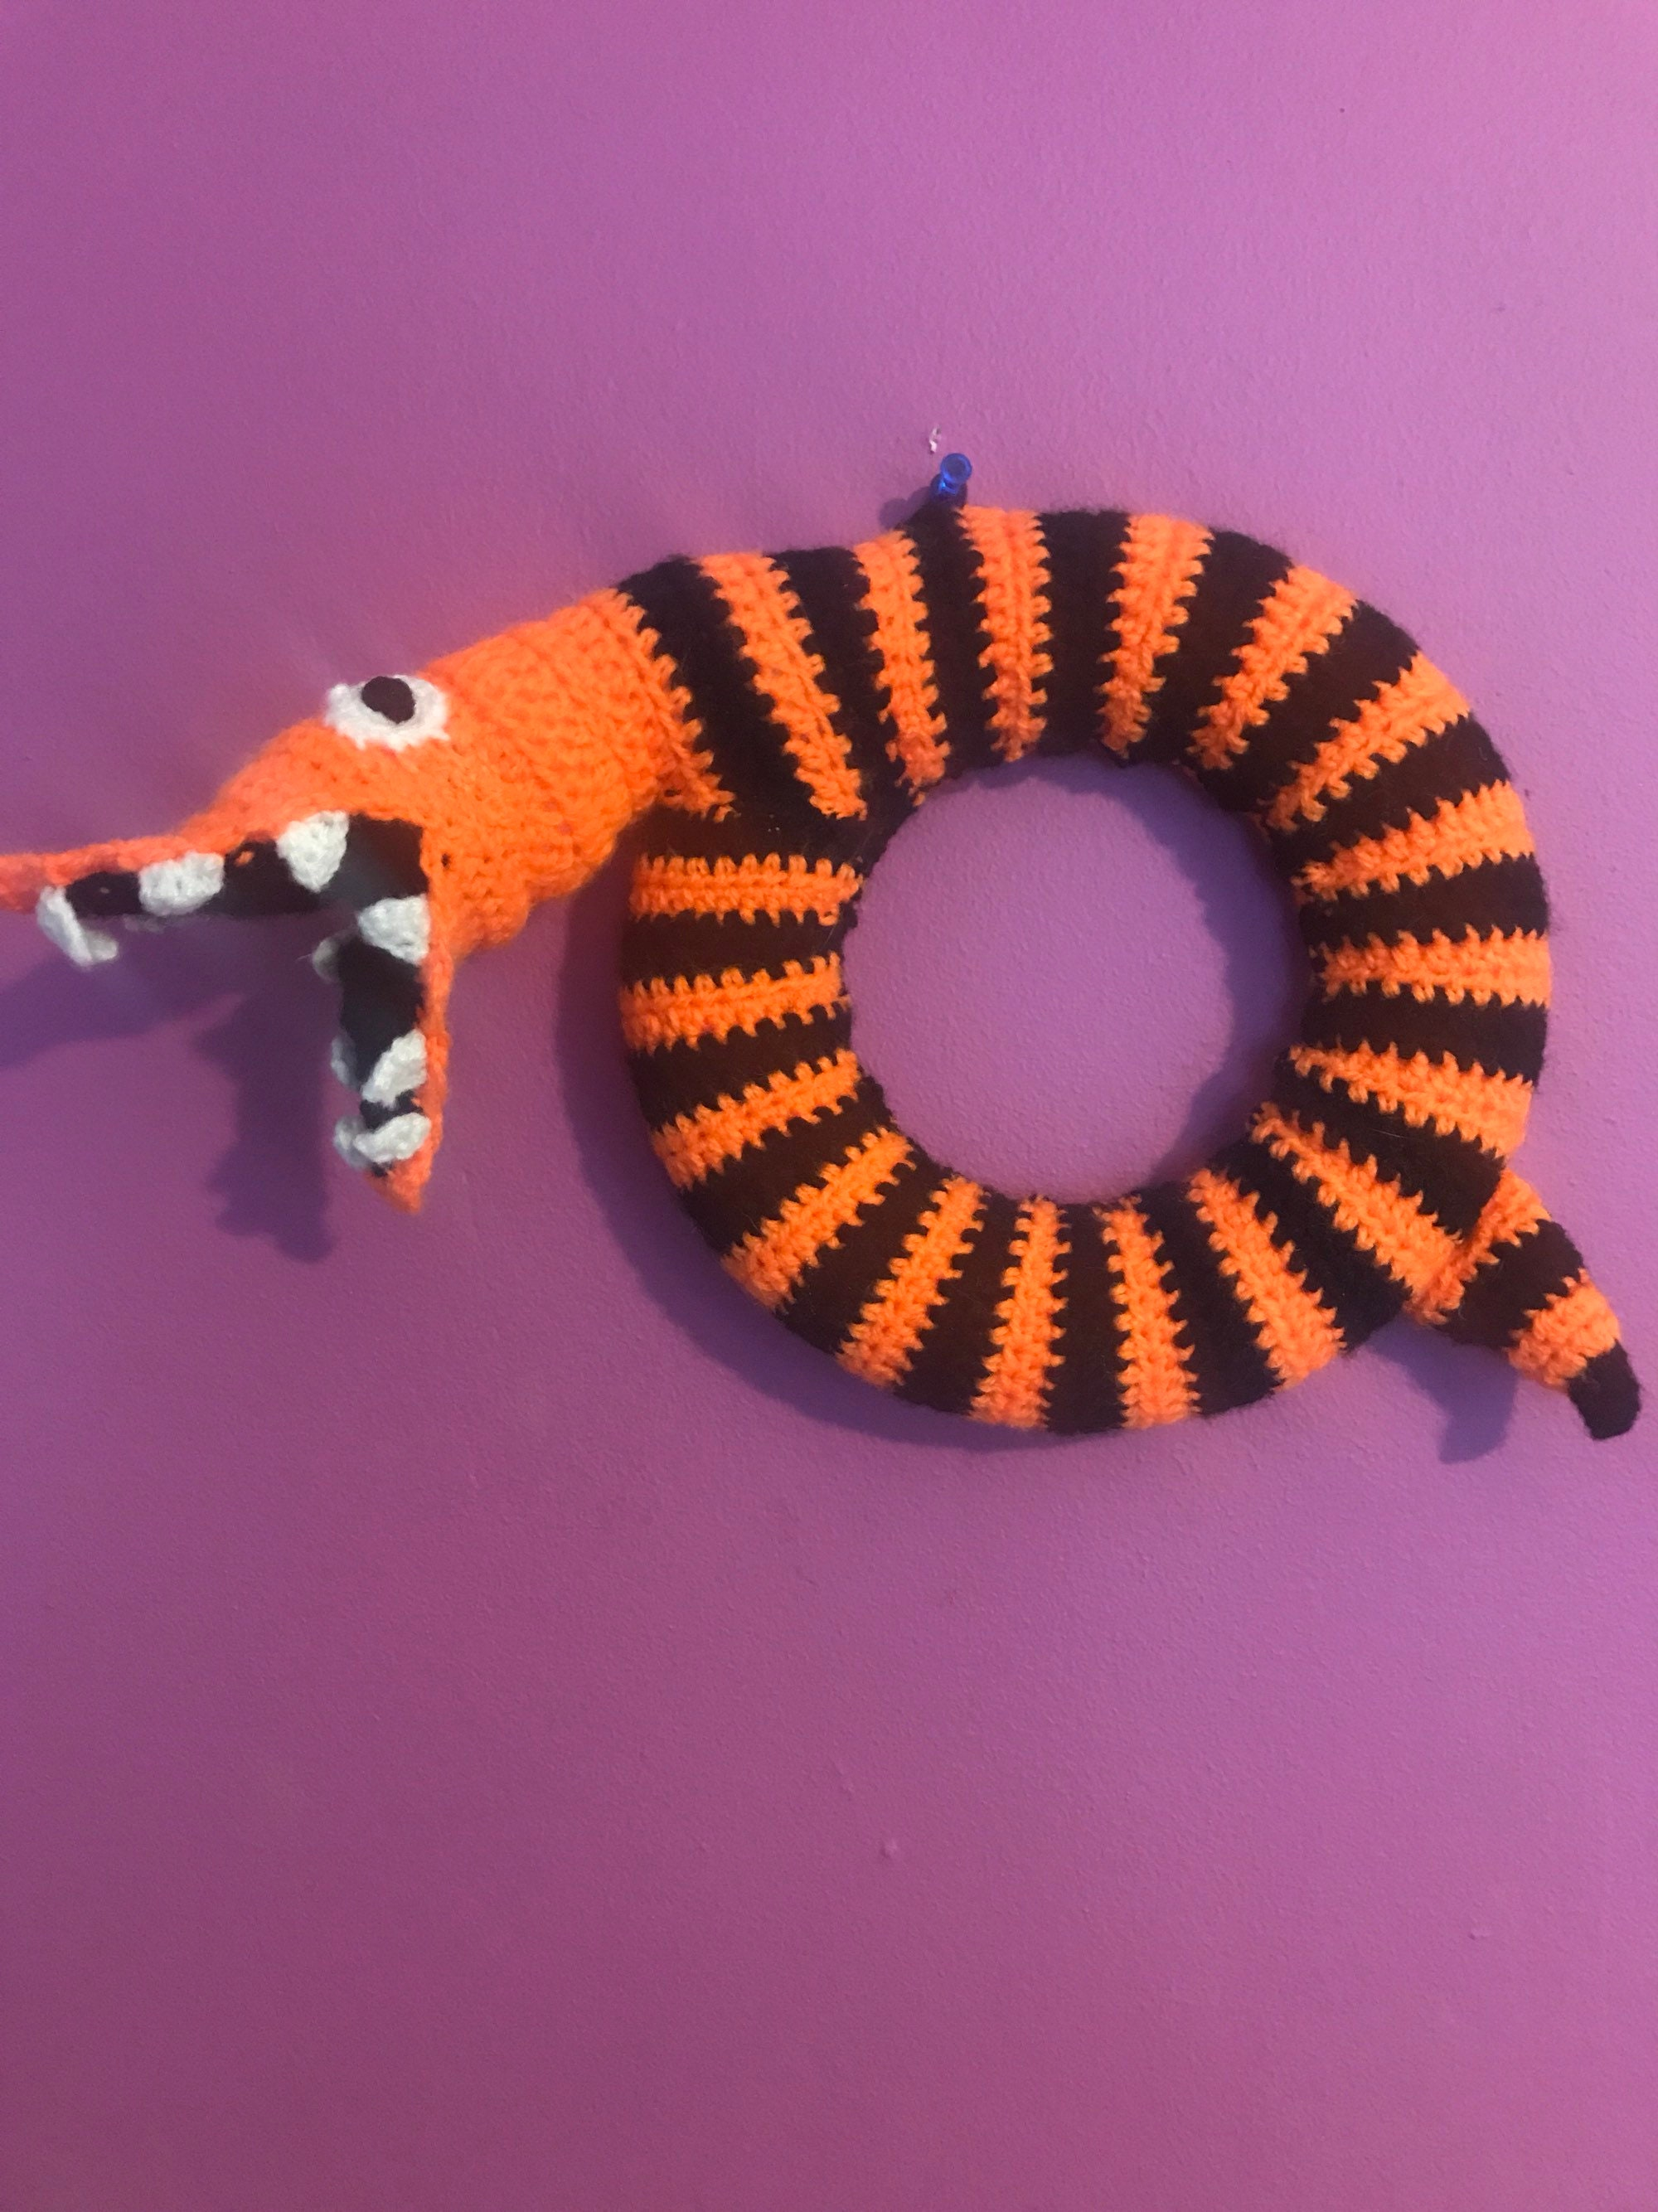 Nbc nightmare before christmas snake wreath handmade crochet | Etsy